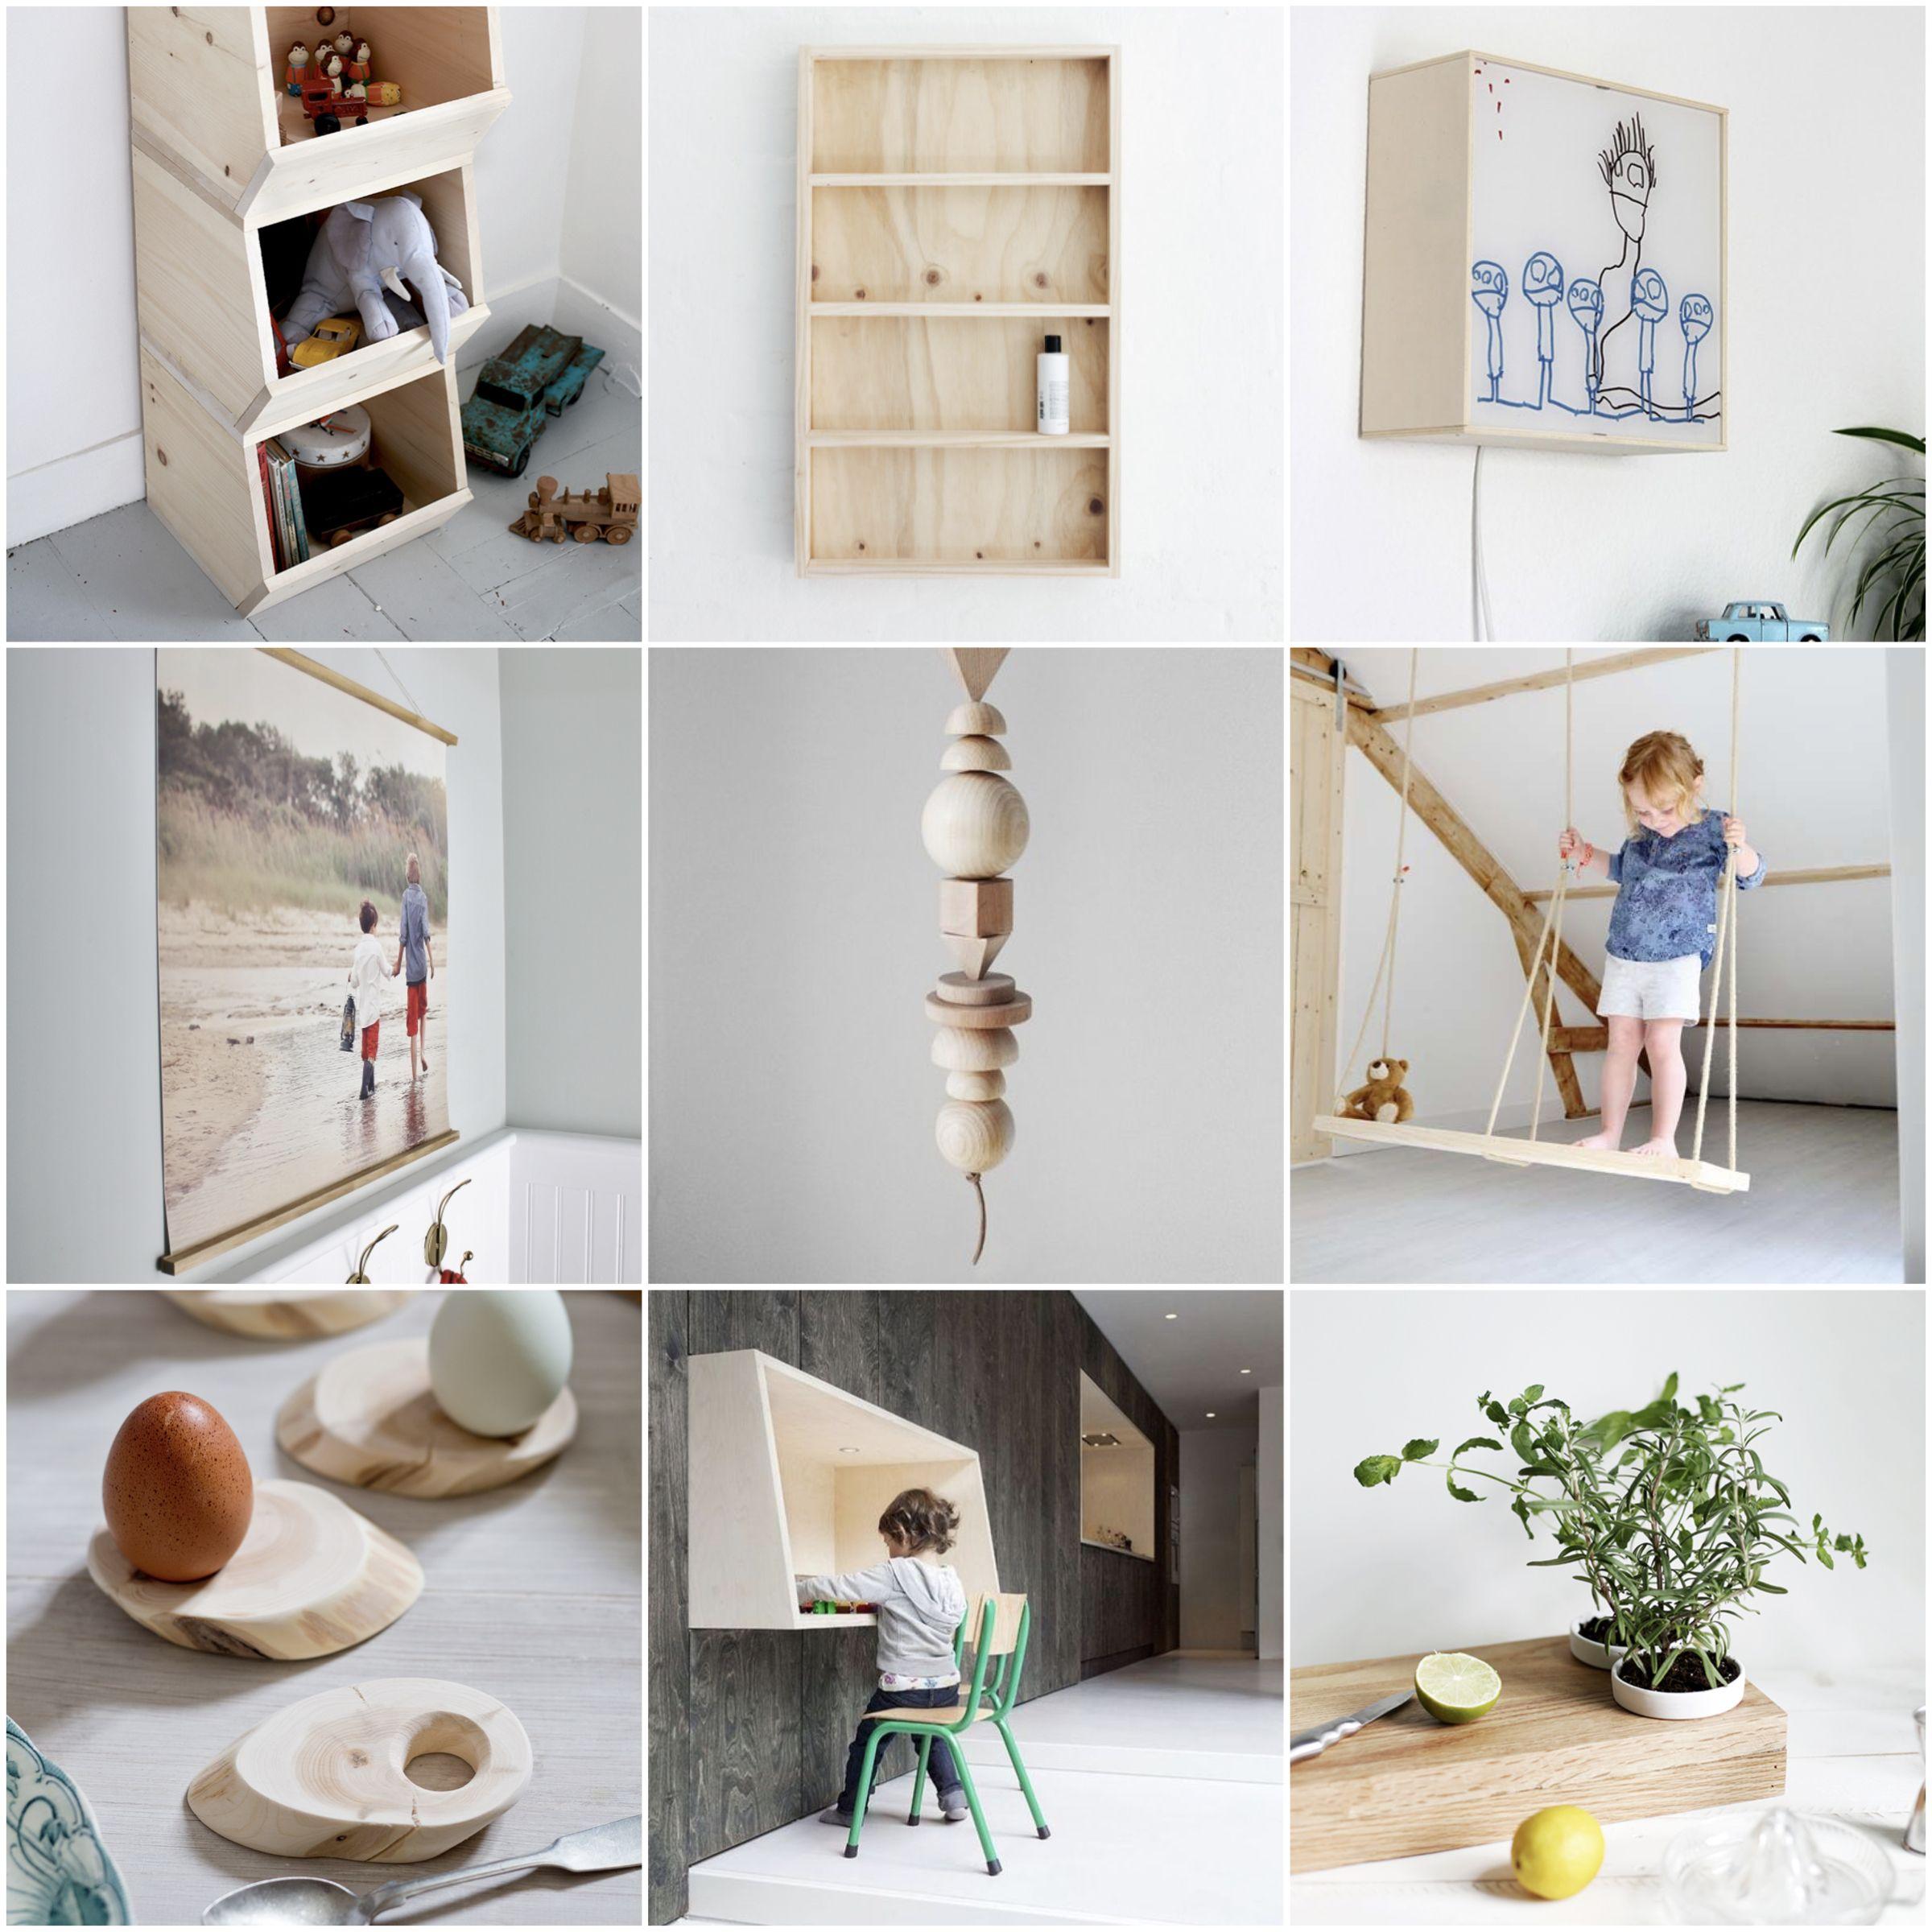 Inspiration // 12 einfach DIYIdeen aus Holz fürs